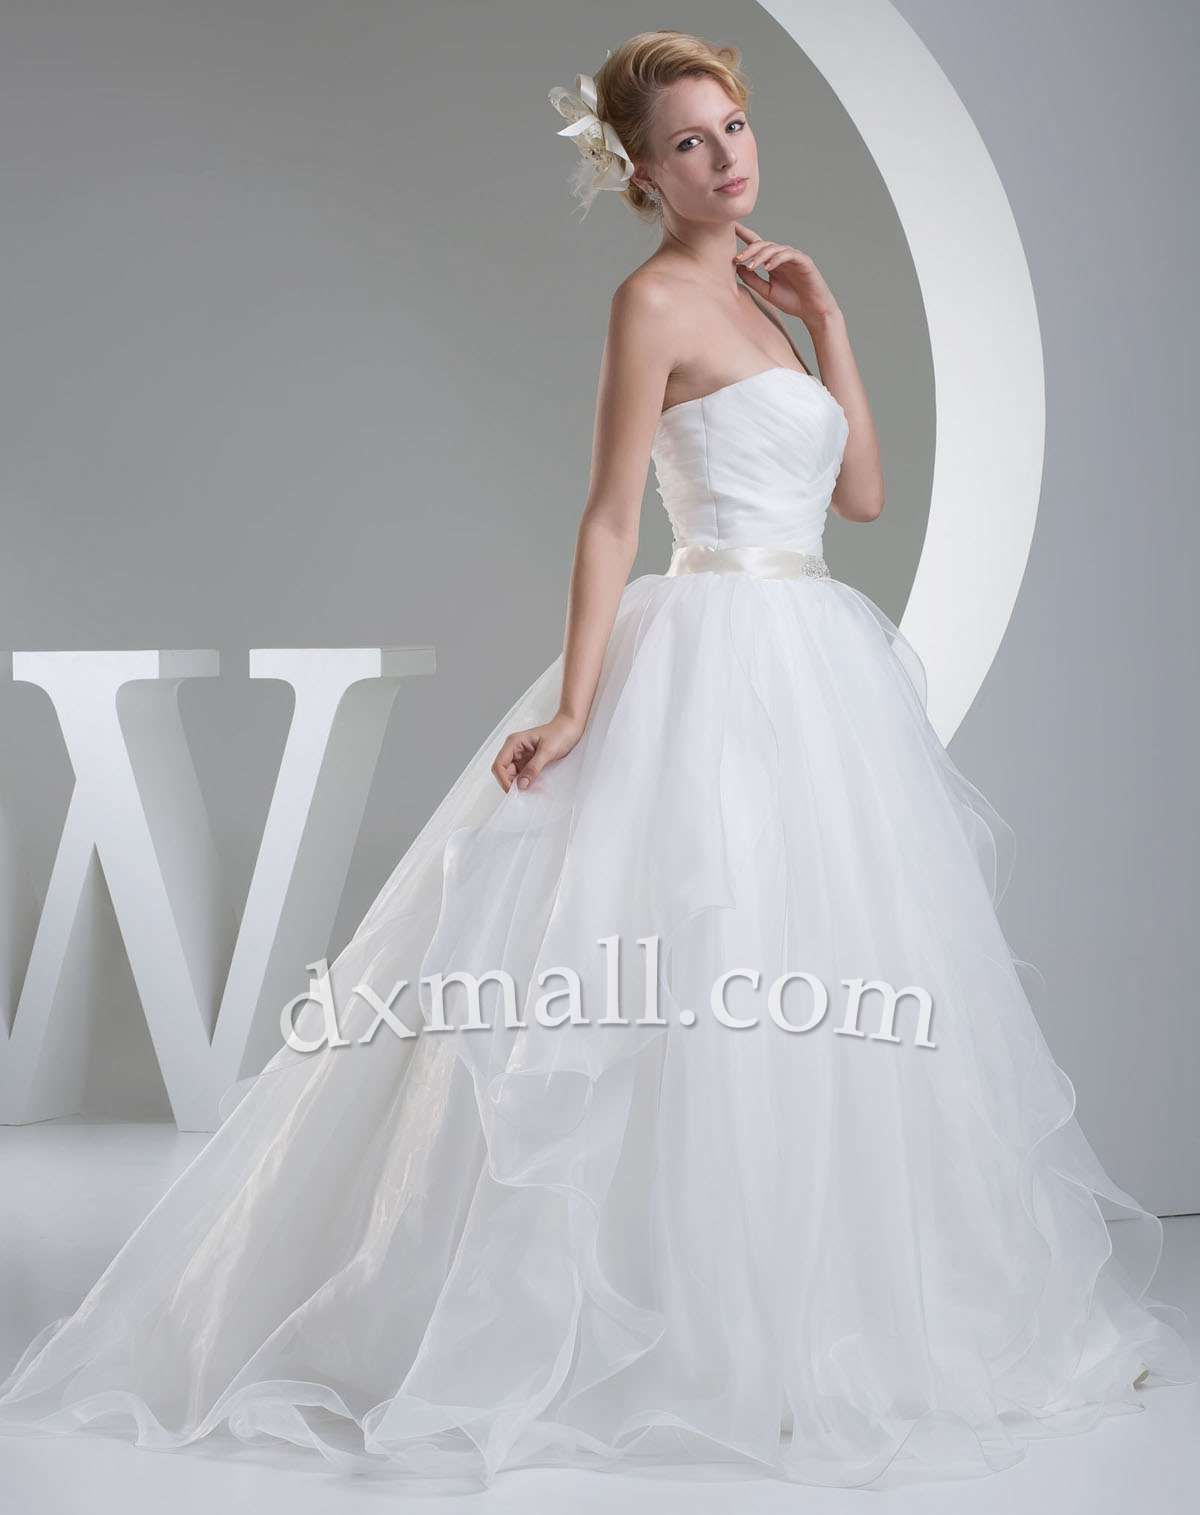 Dropped waist wedding dress  Drop Waist Wedding Dresses Sweetheart SweepBrush Train Diamond